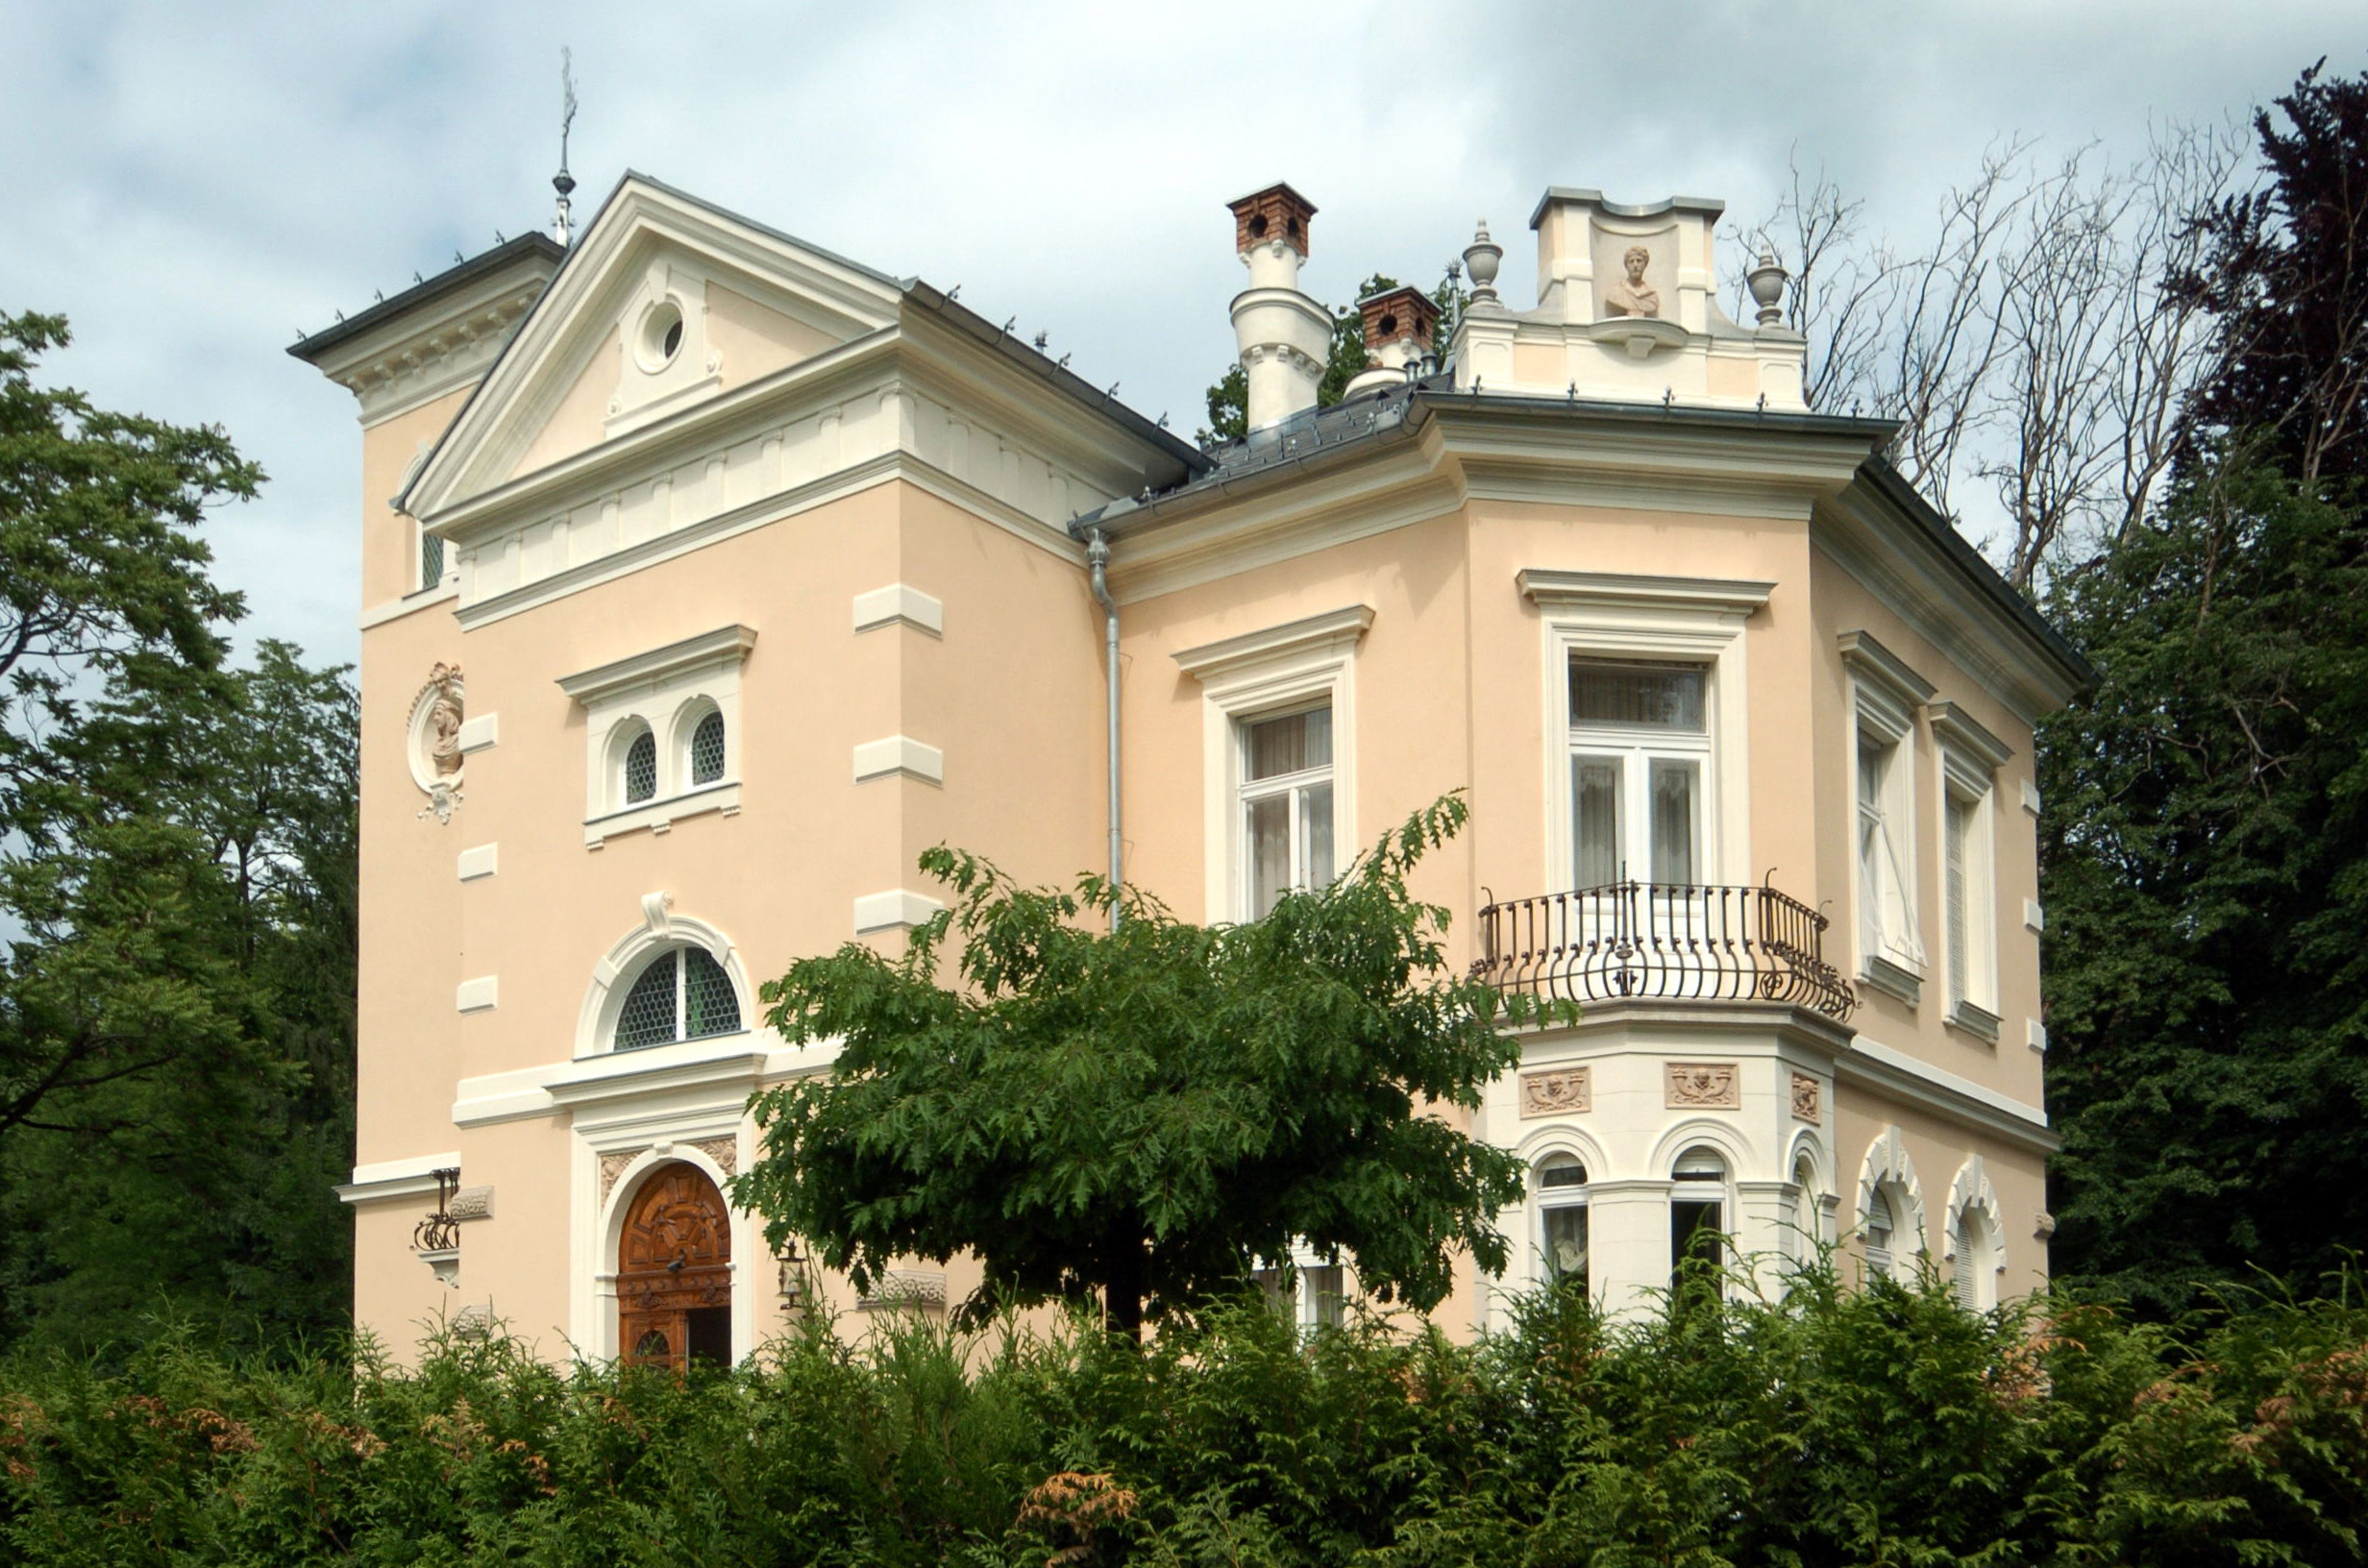 file poertschach villa venezia 30052007 wikimedia commons. Black Bedroom Furniture Sets. Home Design Ideas